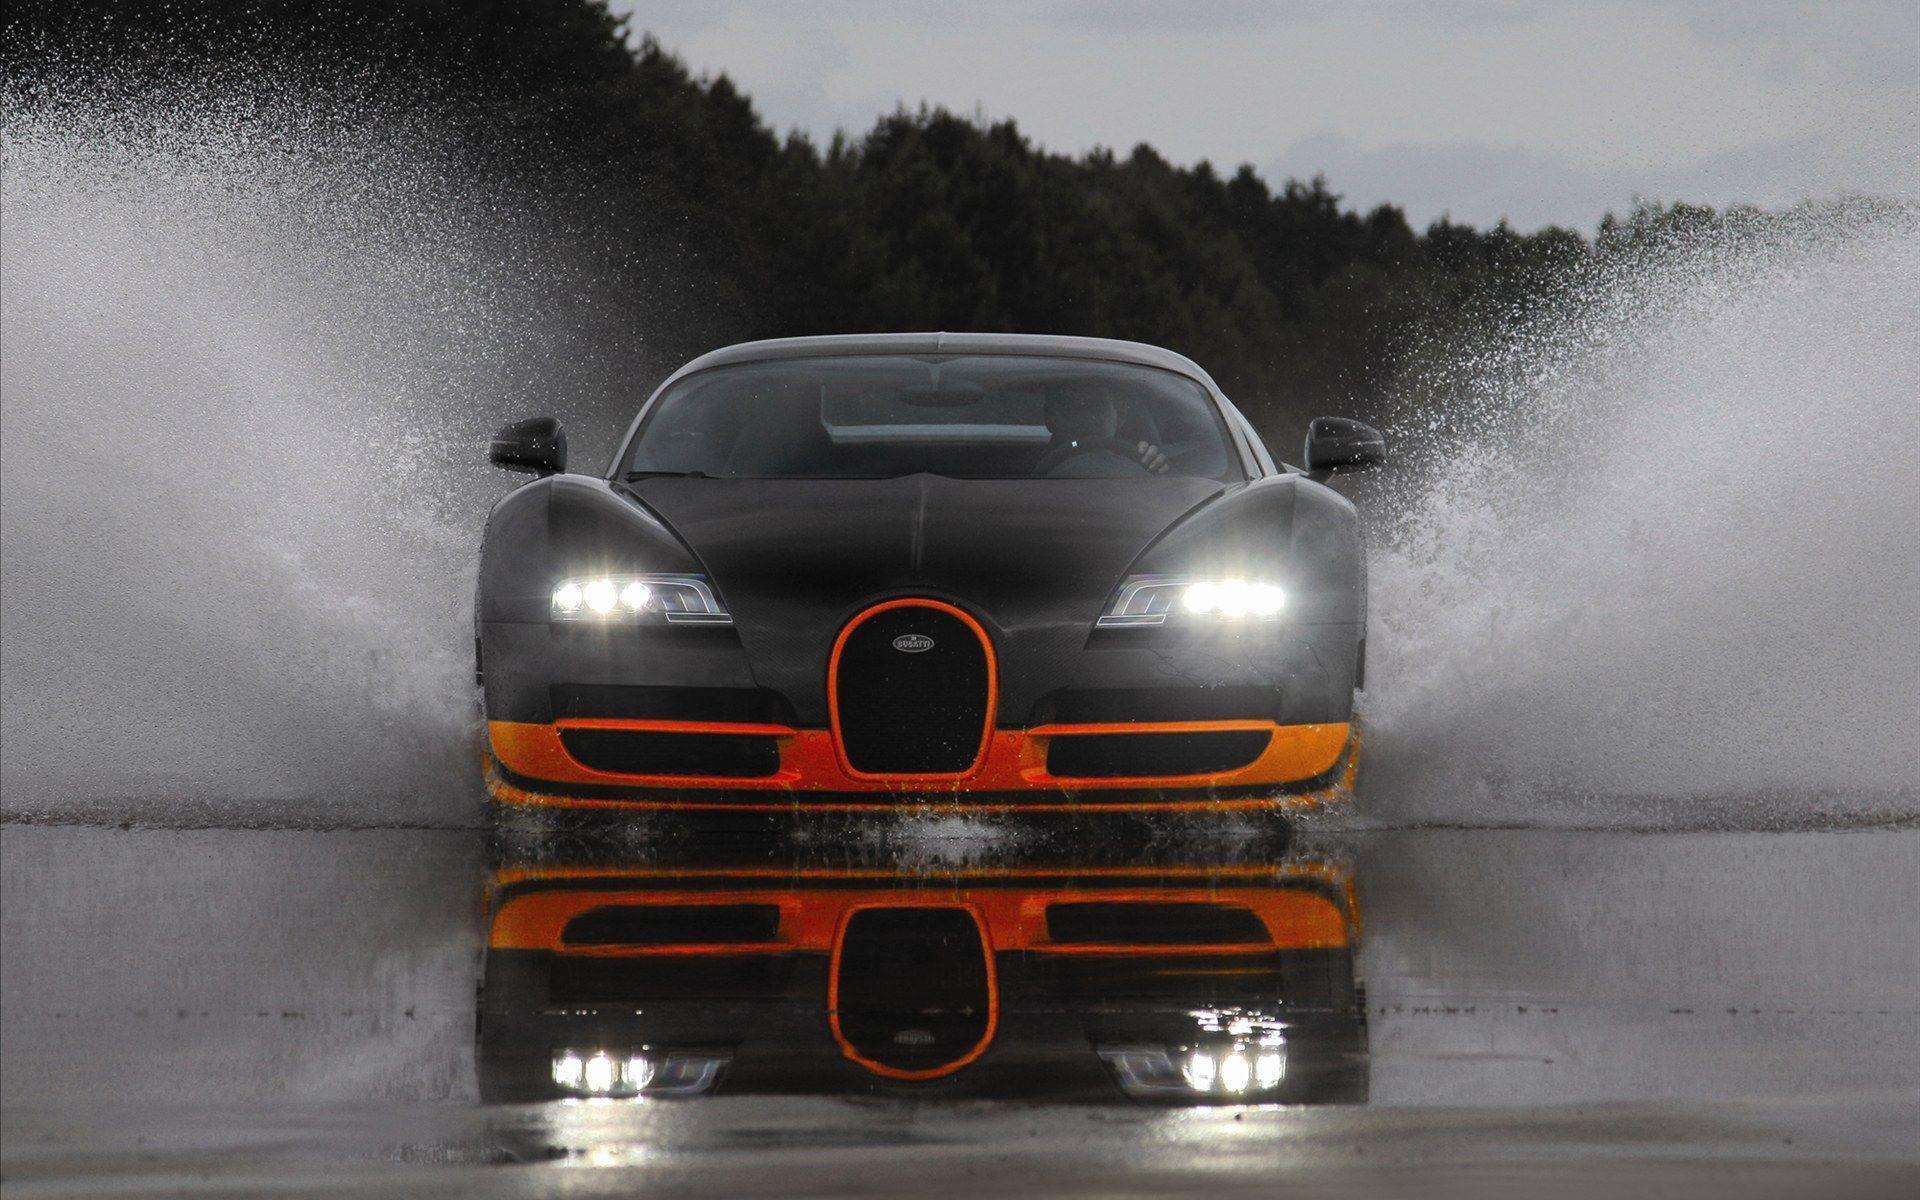 Bugatti Veyron Super Sport Wallpapers Wallpaper Cave Bugatti Veyron Bugatti Veyron Super Sport Bugatti